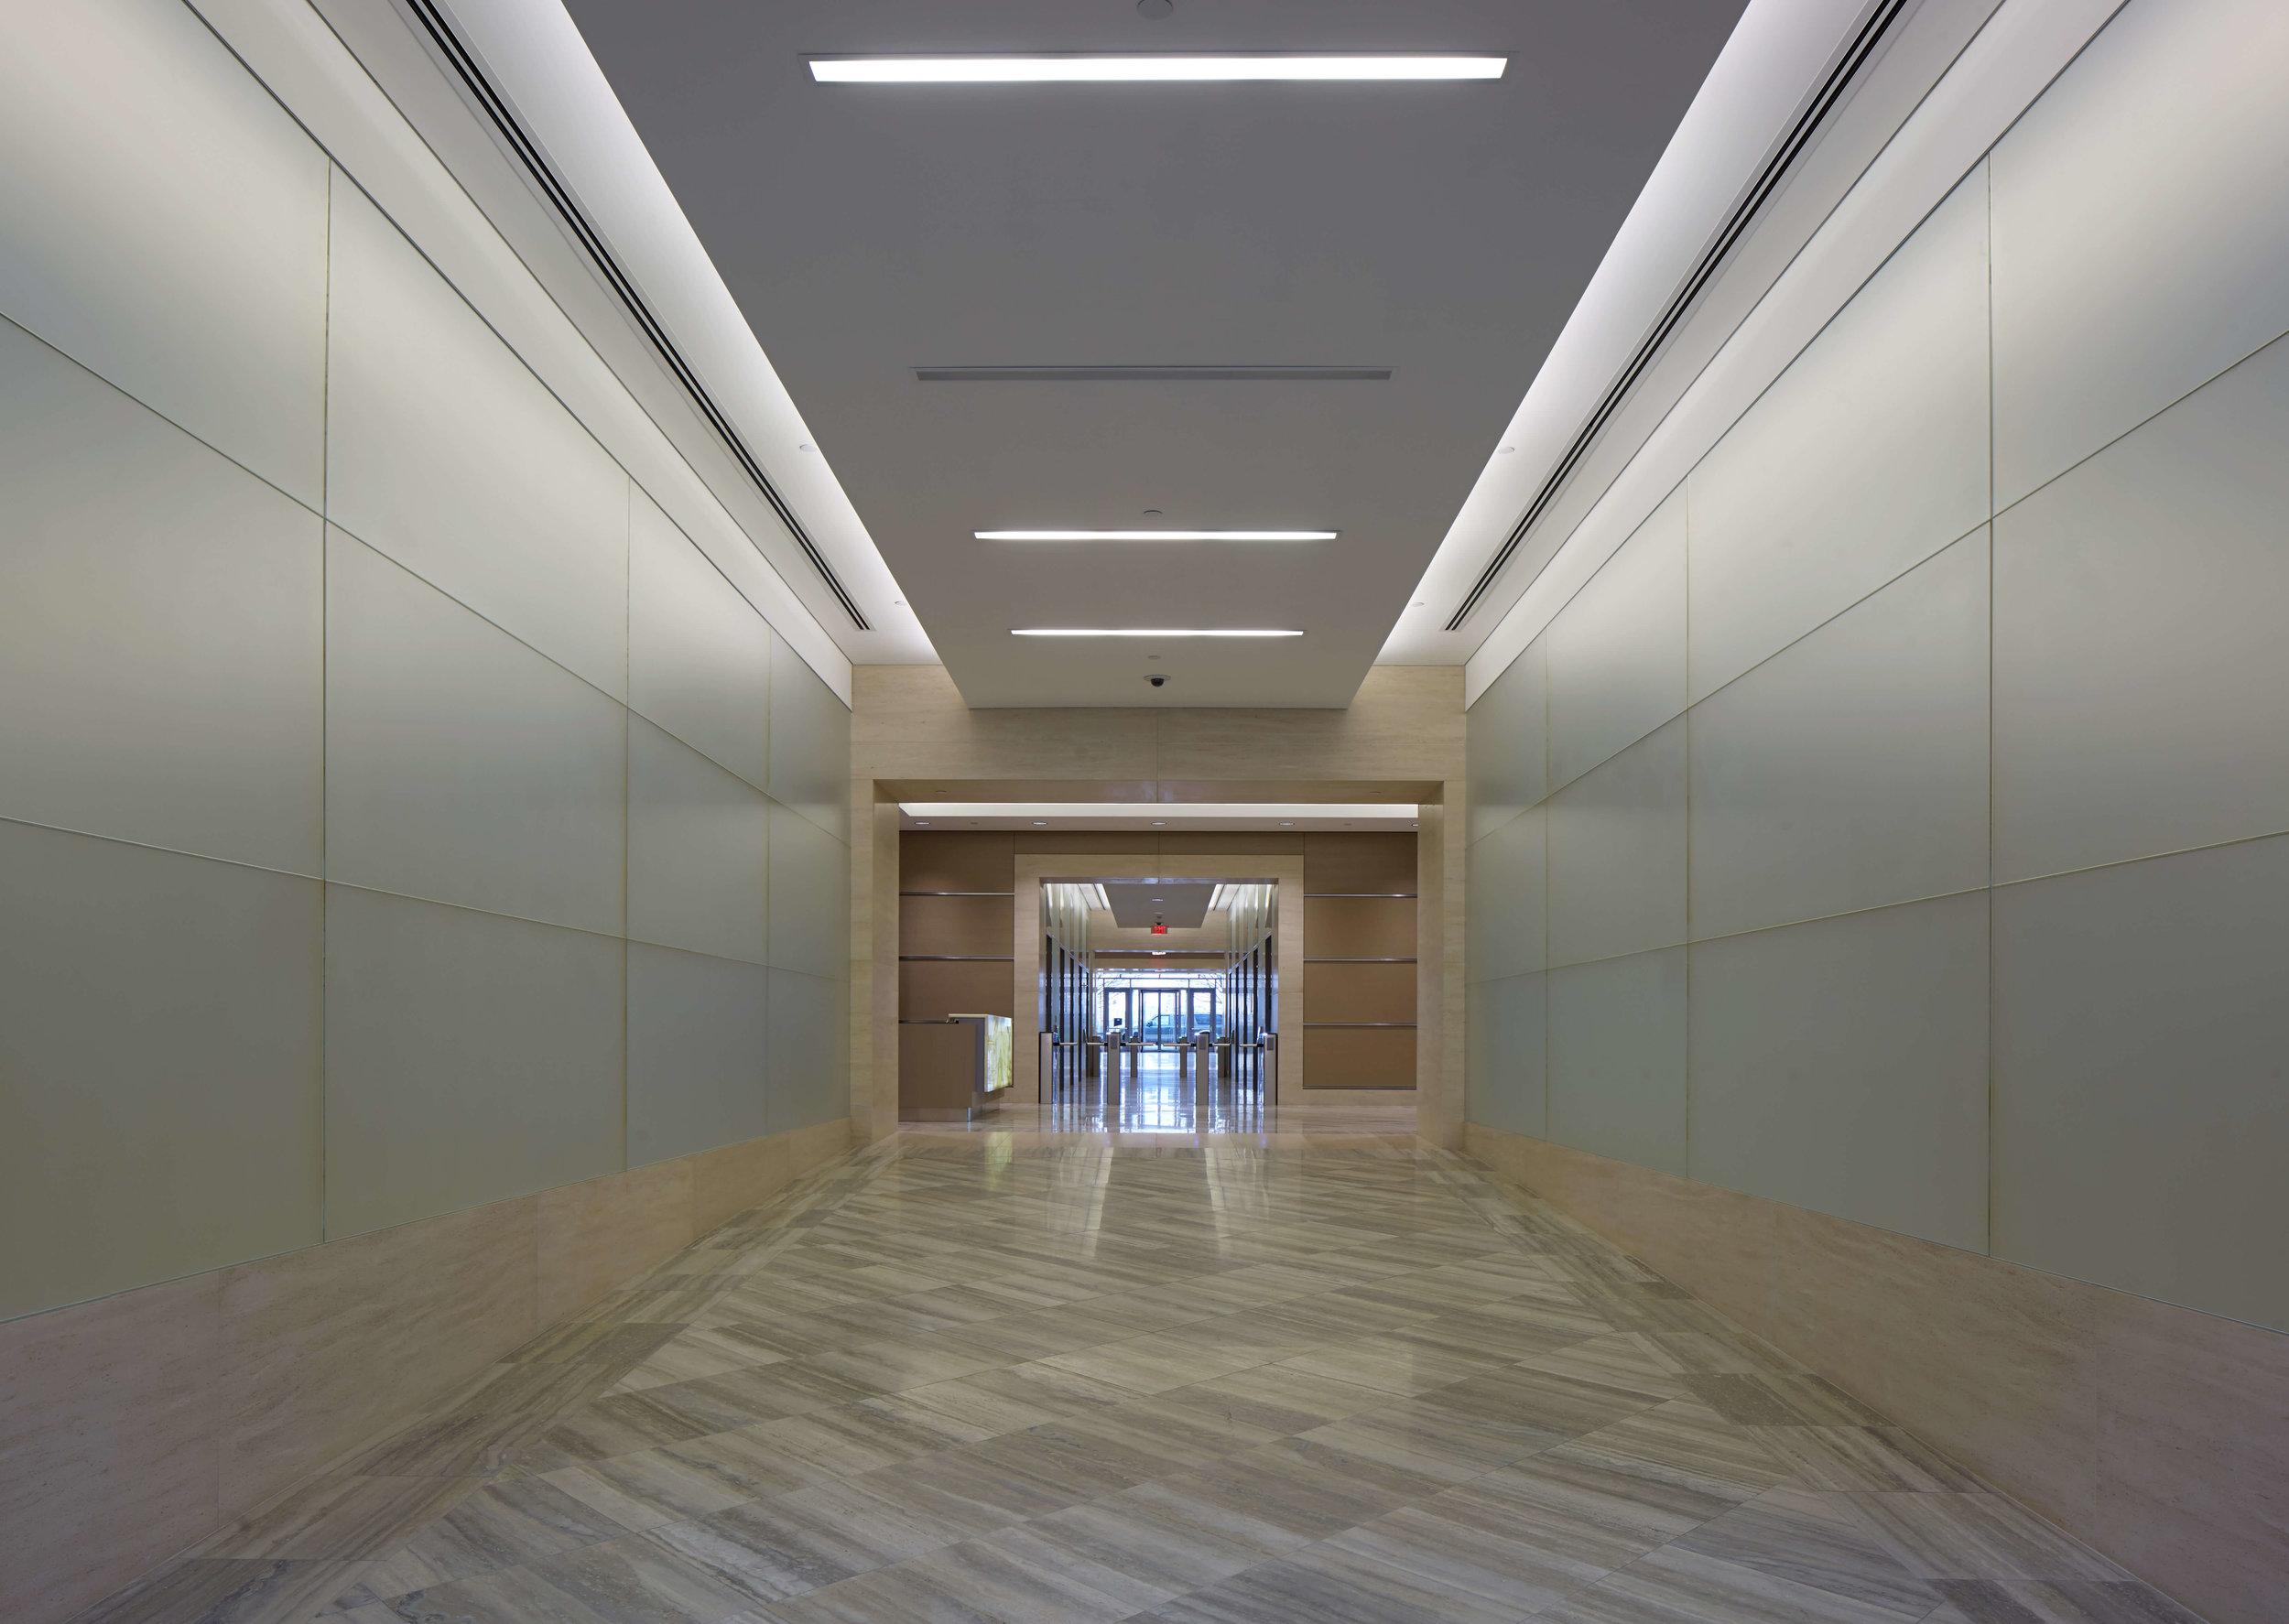 Waterfront-Interior-Lobby-3.jpg